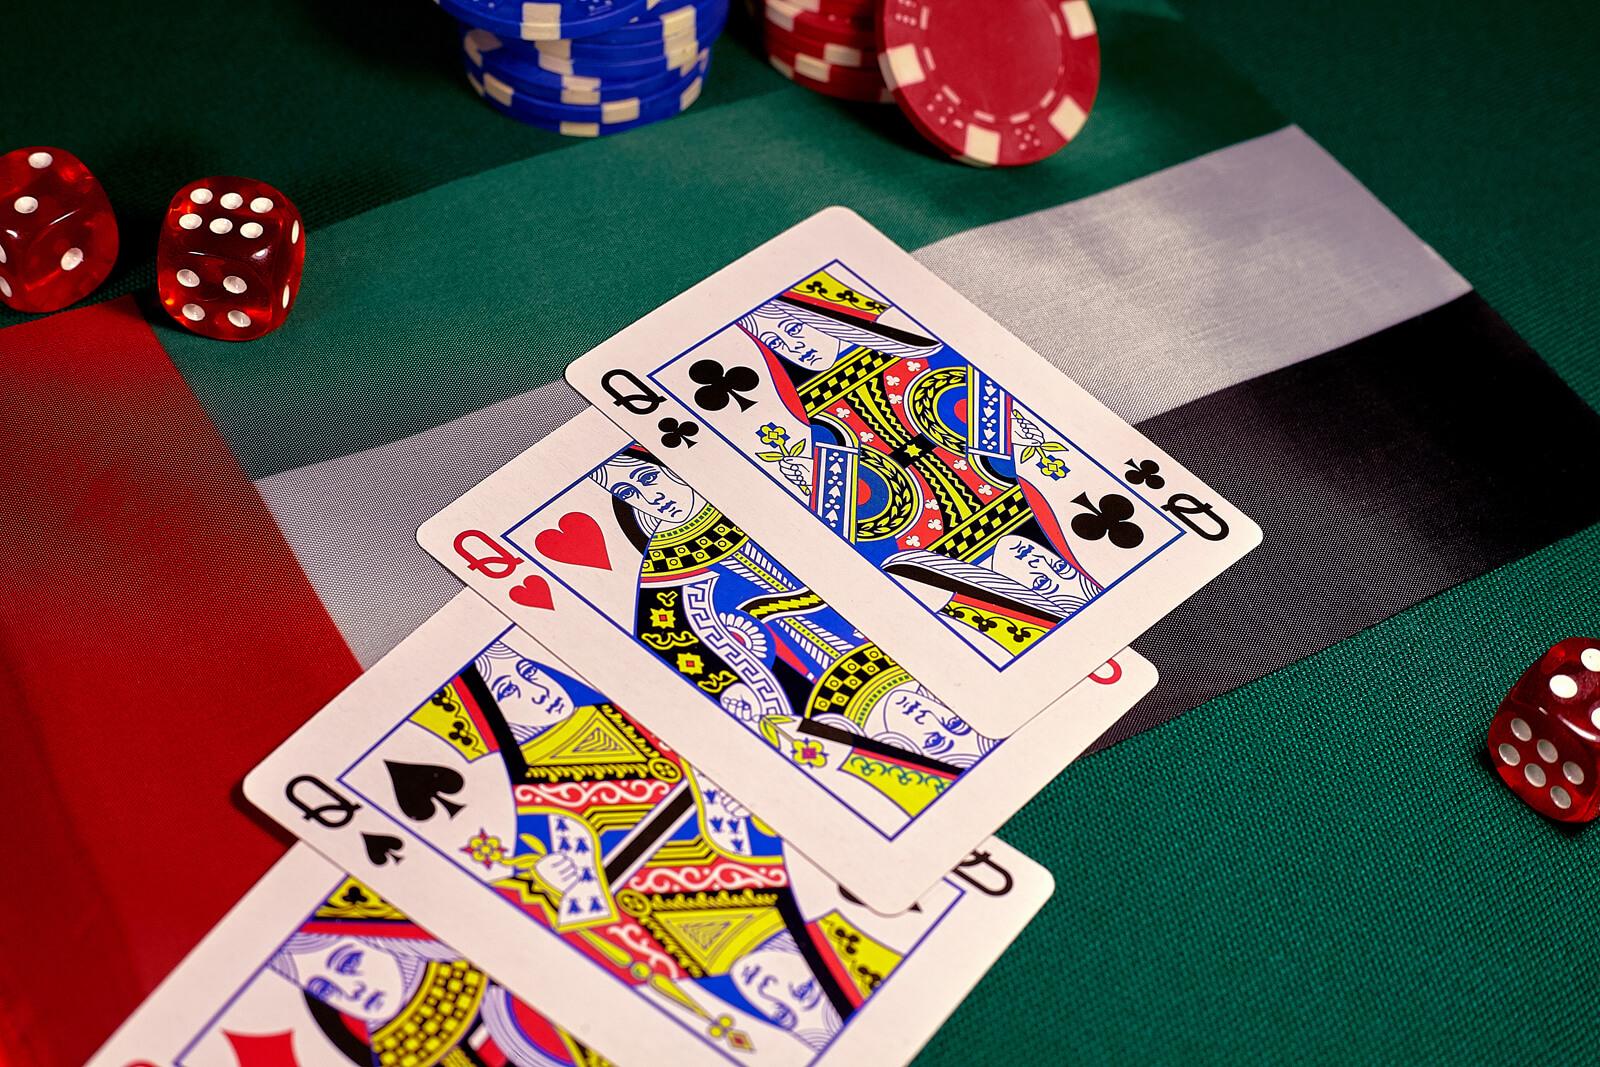 Casino Poker Gambling Poker Table Card Game